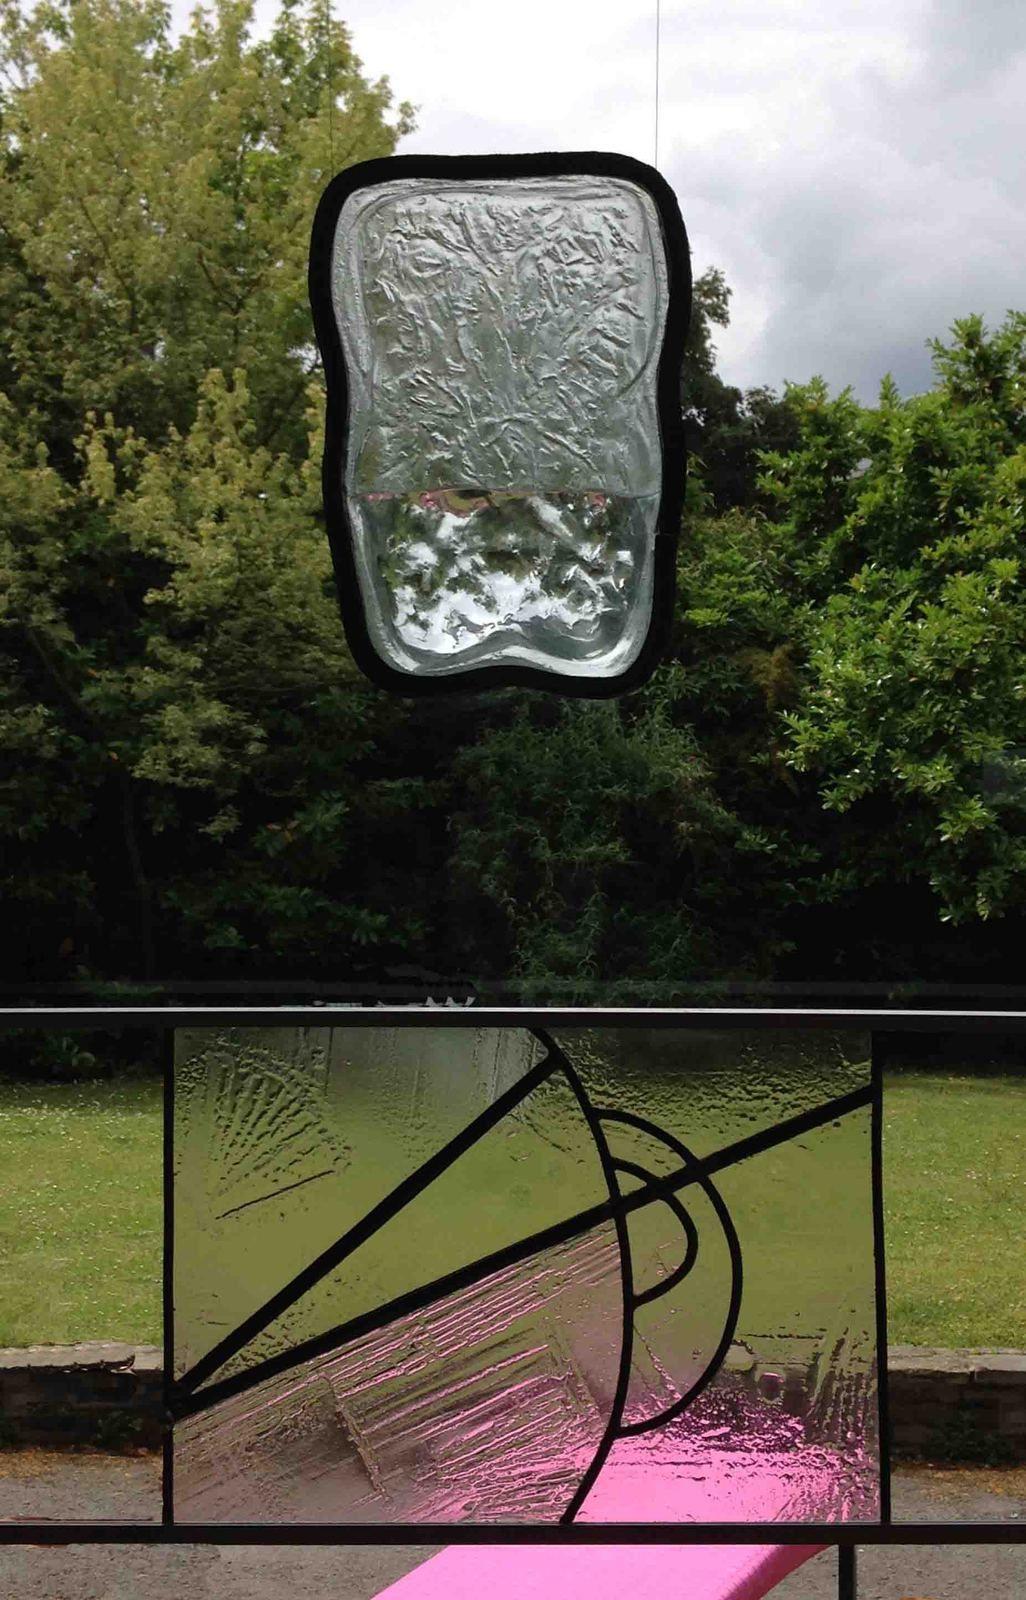 exposition vitrail et transparence 2014-15